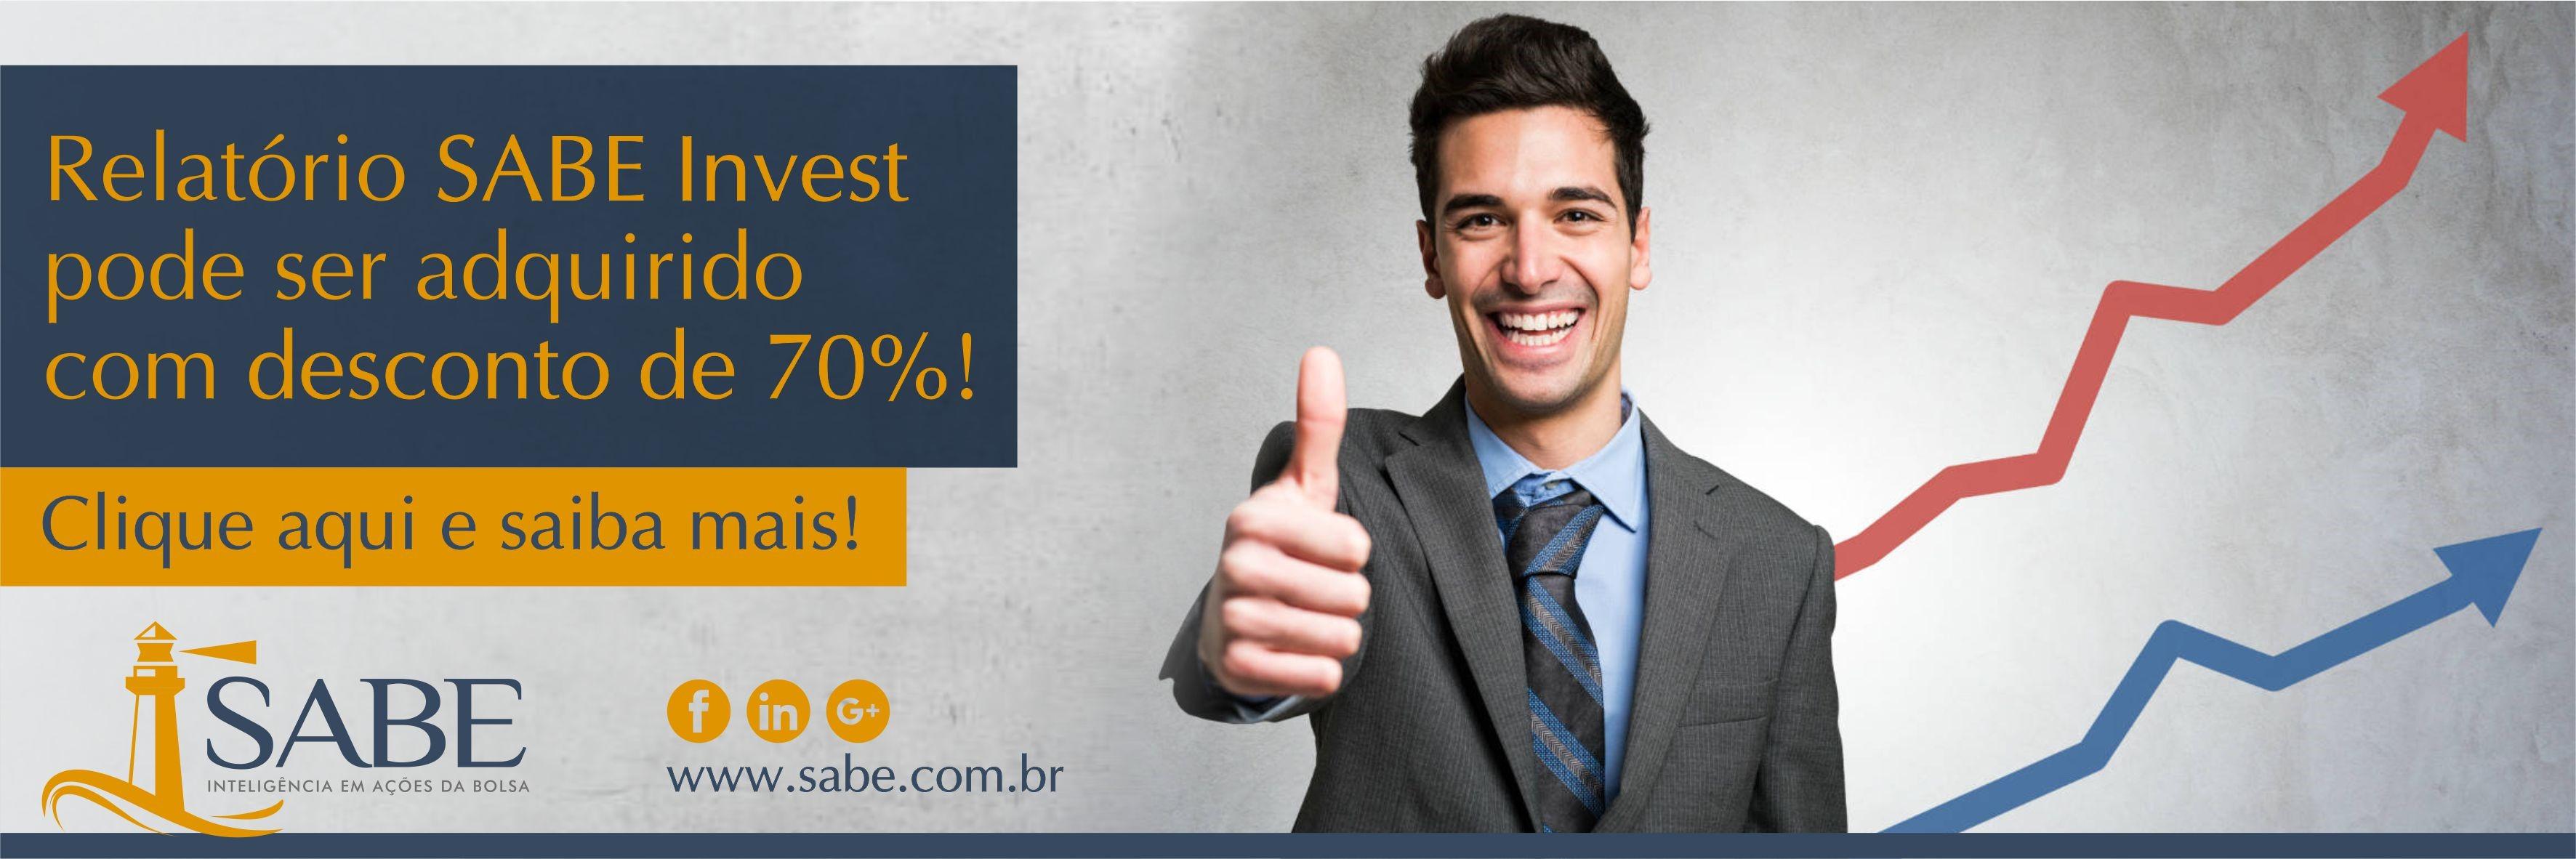 Promo SABE Invest